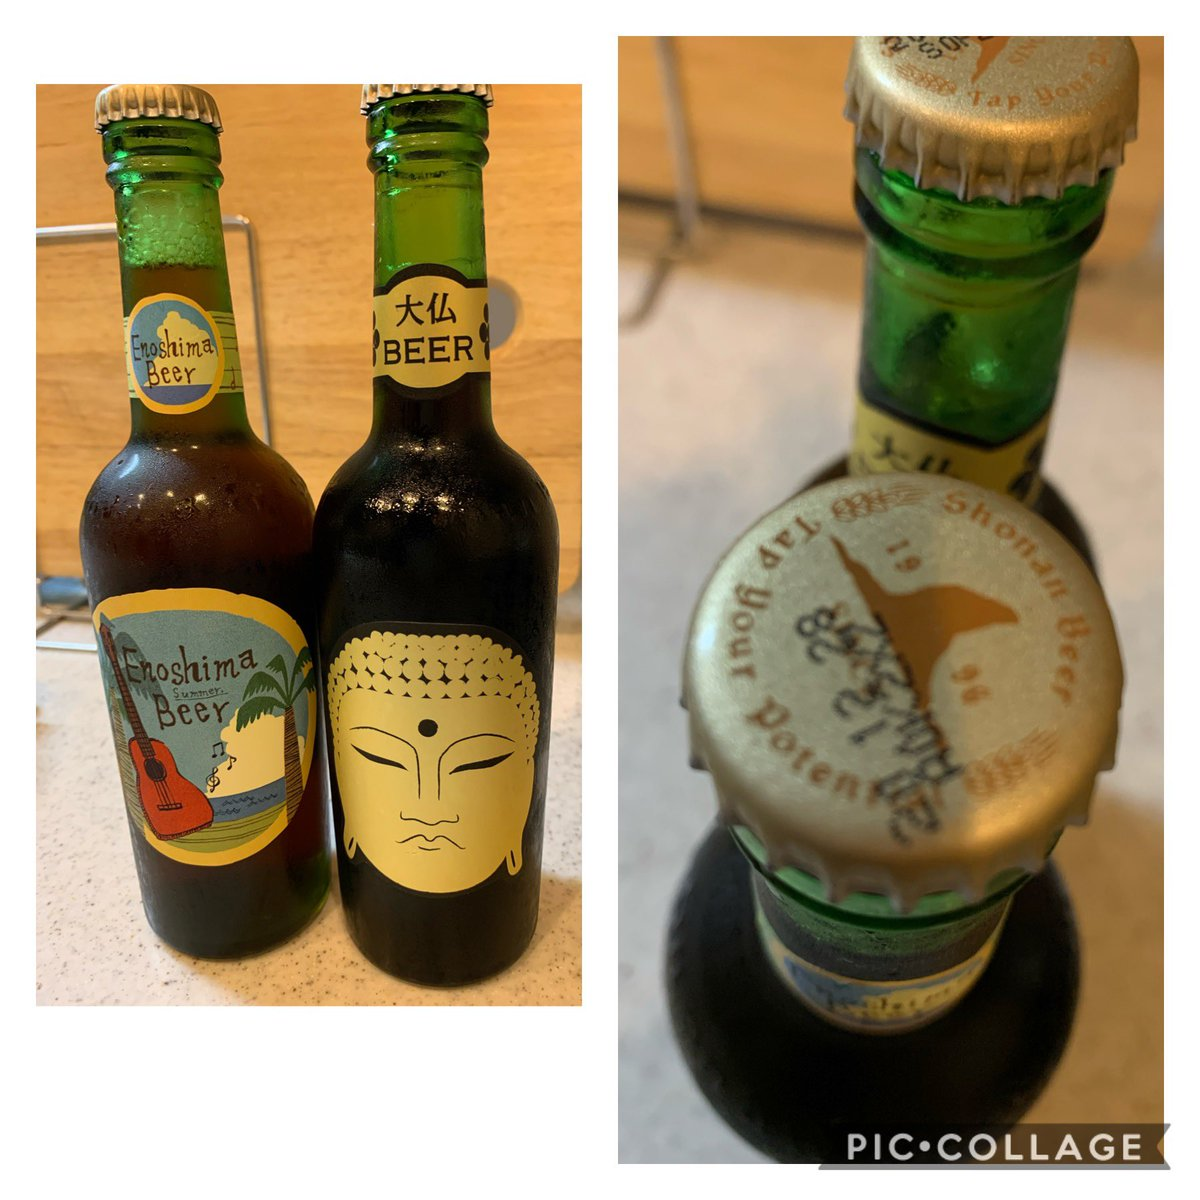 test ツイッターメディア - からの、湘南唯一の蔵元 熊澤酒造株式会社のMOKICHI Baker & Sweets  ステキなところです♡  クラフトビールはお土産に https://t.co/Vm8lbOtX6G